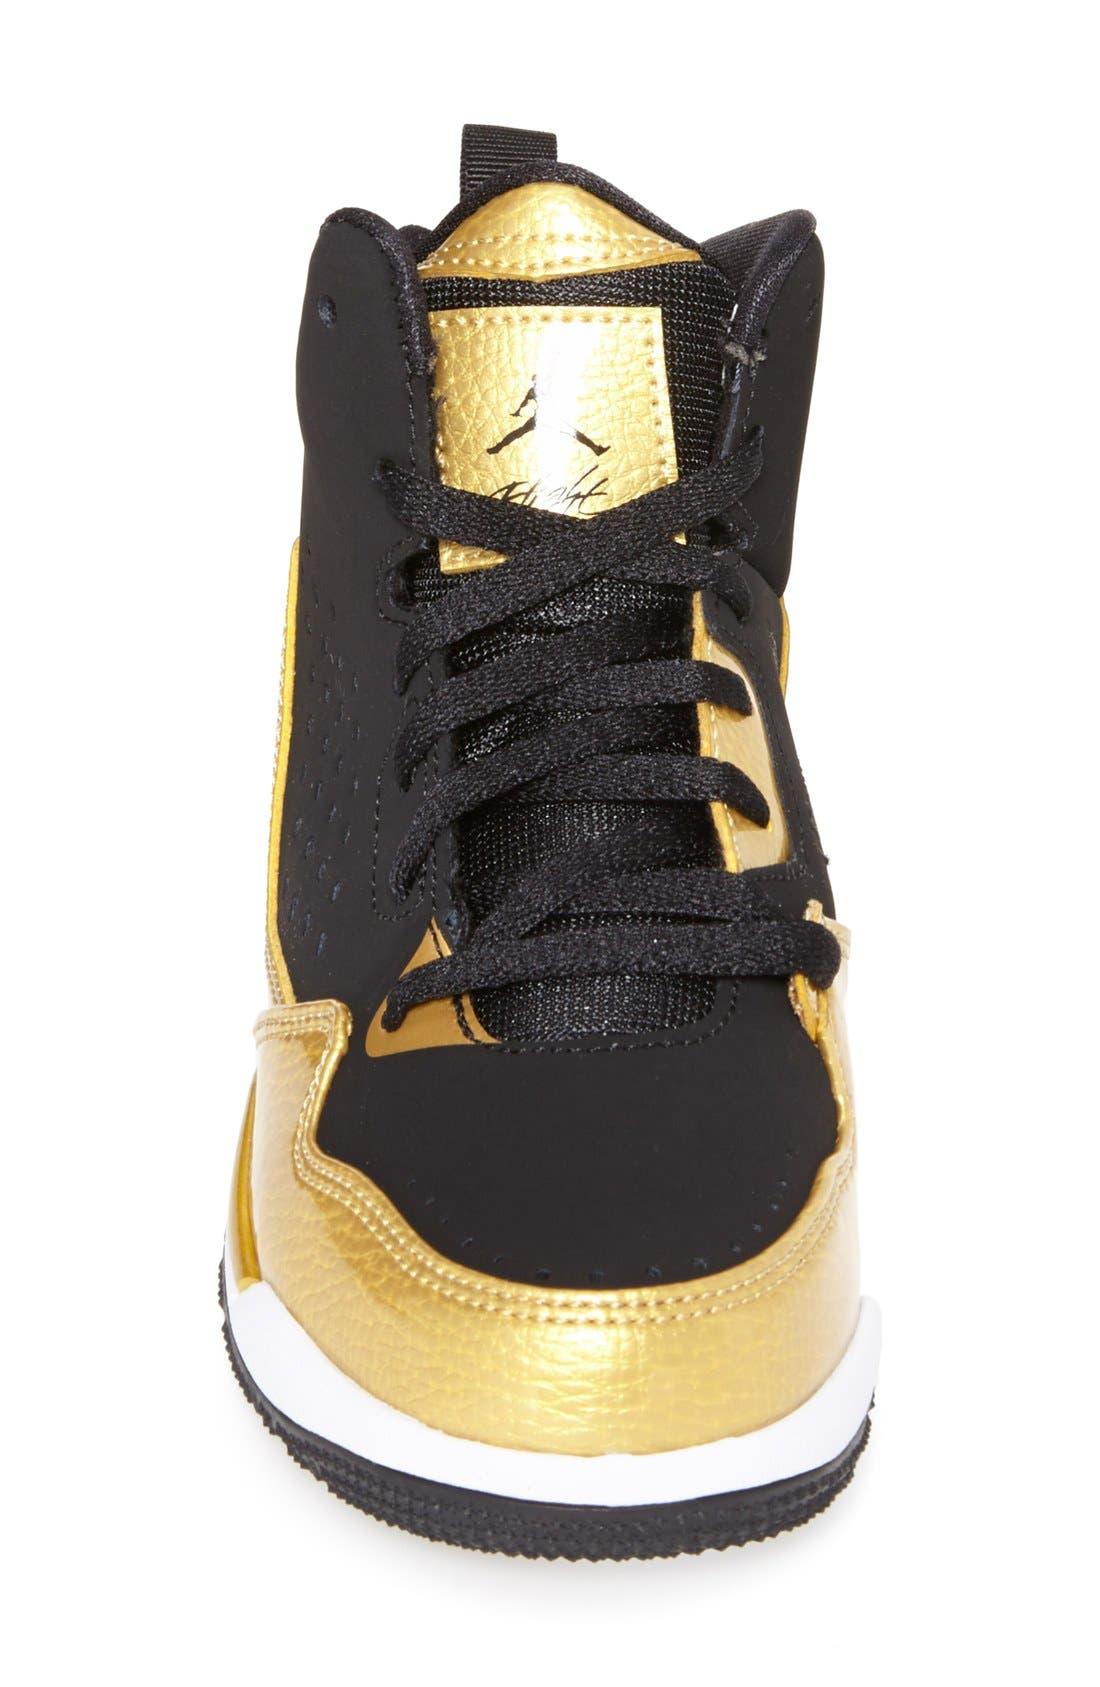 Alternate Image 3  - Nike 'Jordan SC3' Basketball Shoe (Toddler & Little Kid)